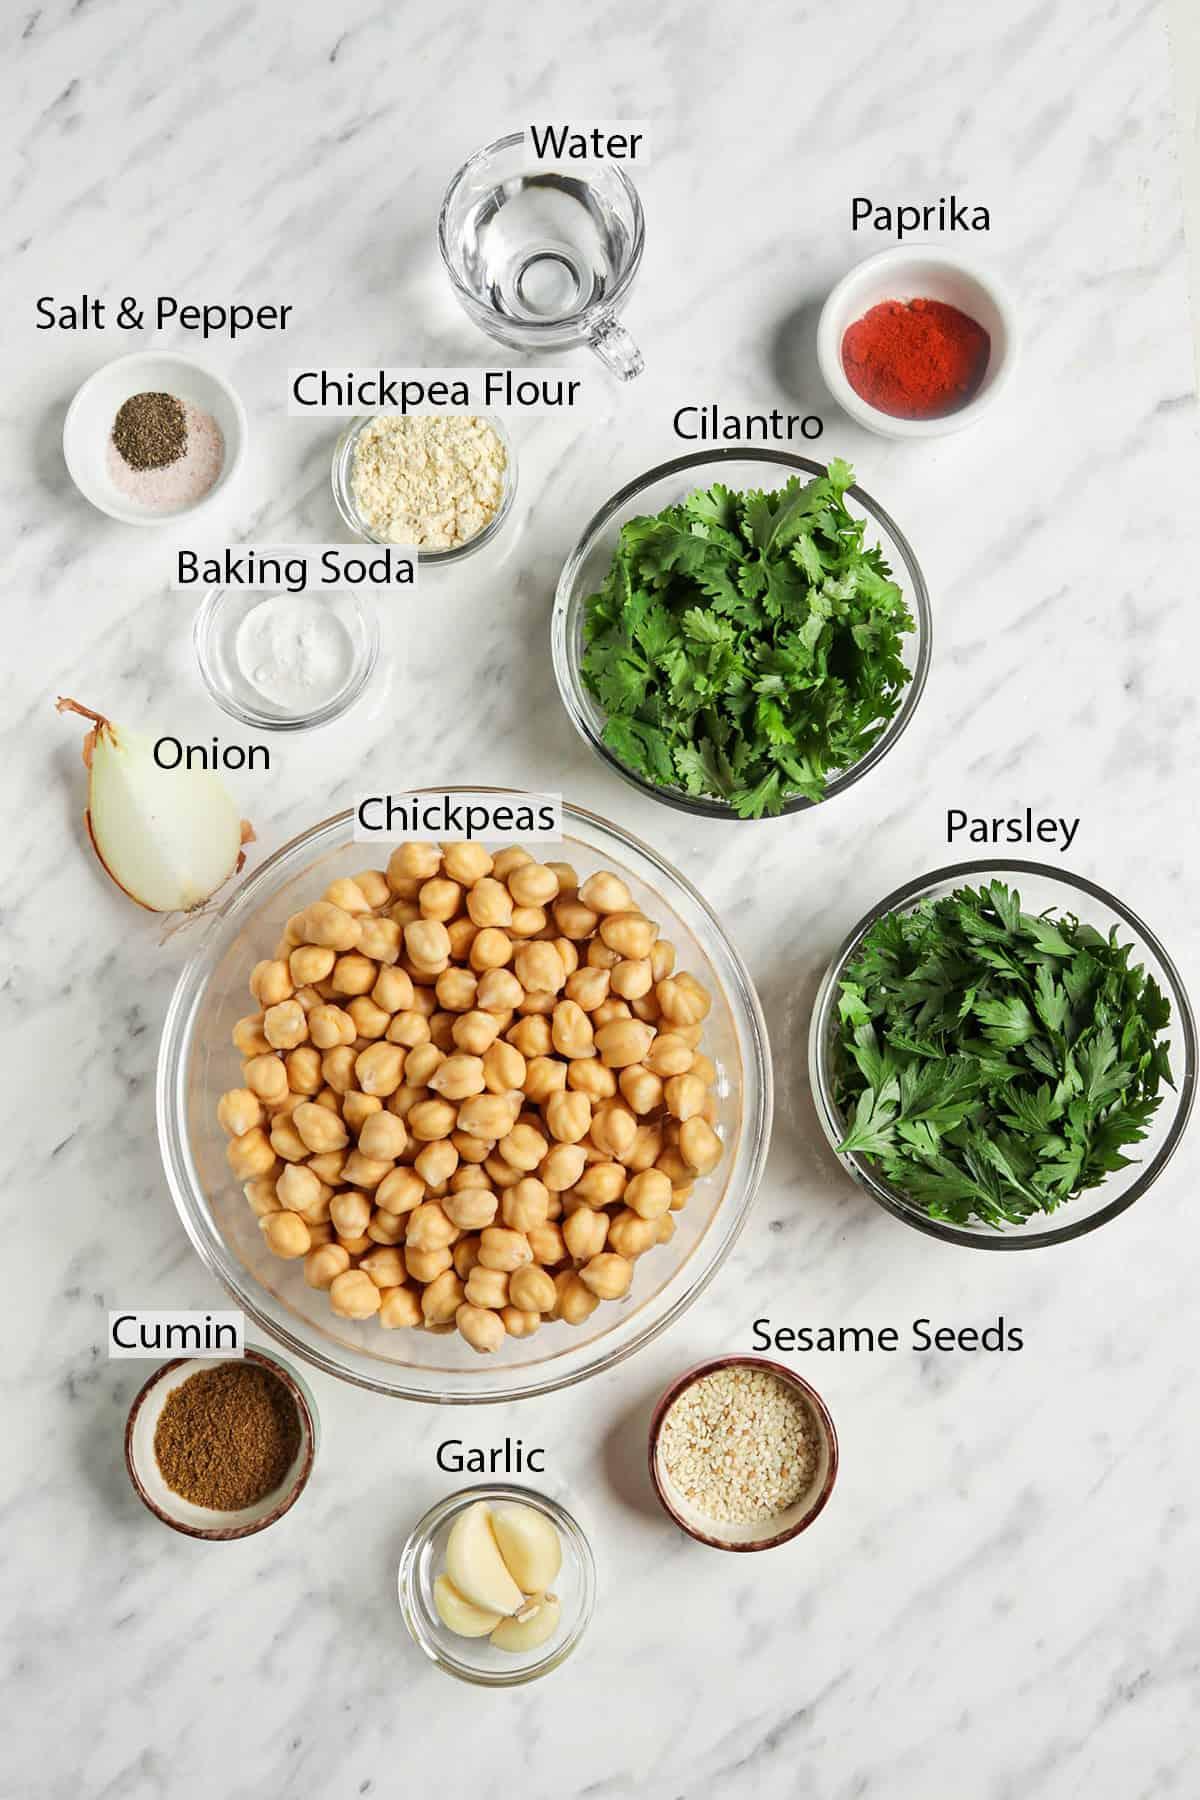 chickpeas, parsley, cilantro, sesame seeds, garlic, cumin, onion, baking soda, salt, pepper, water, chickpea flour, paprika